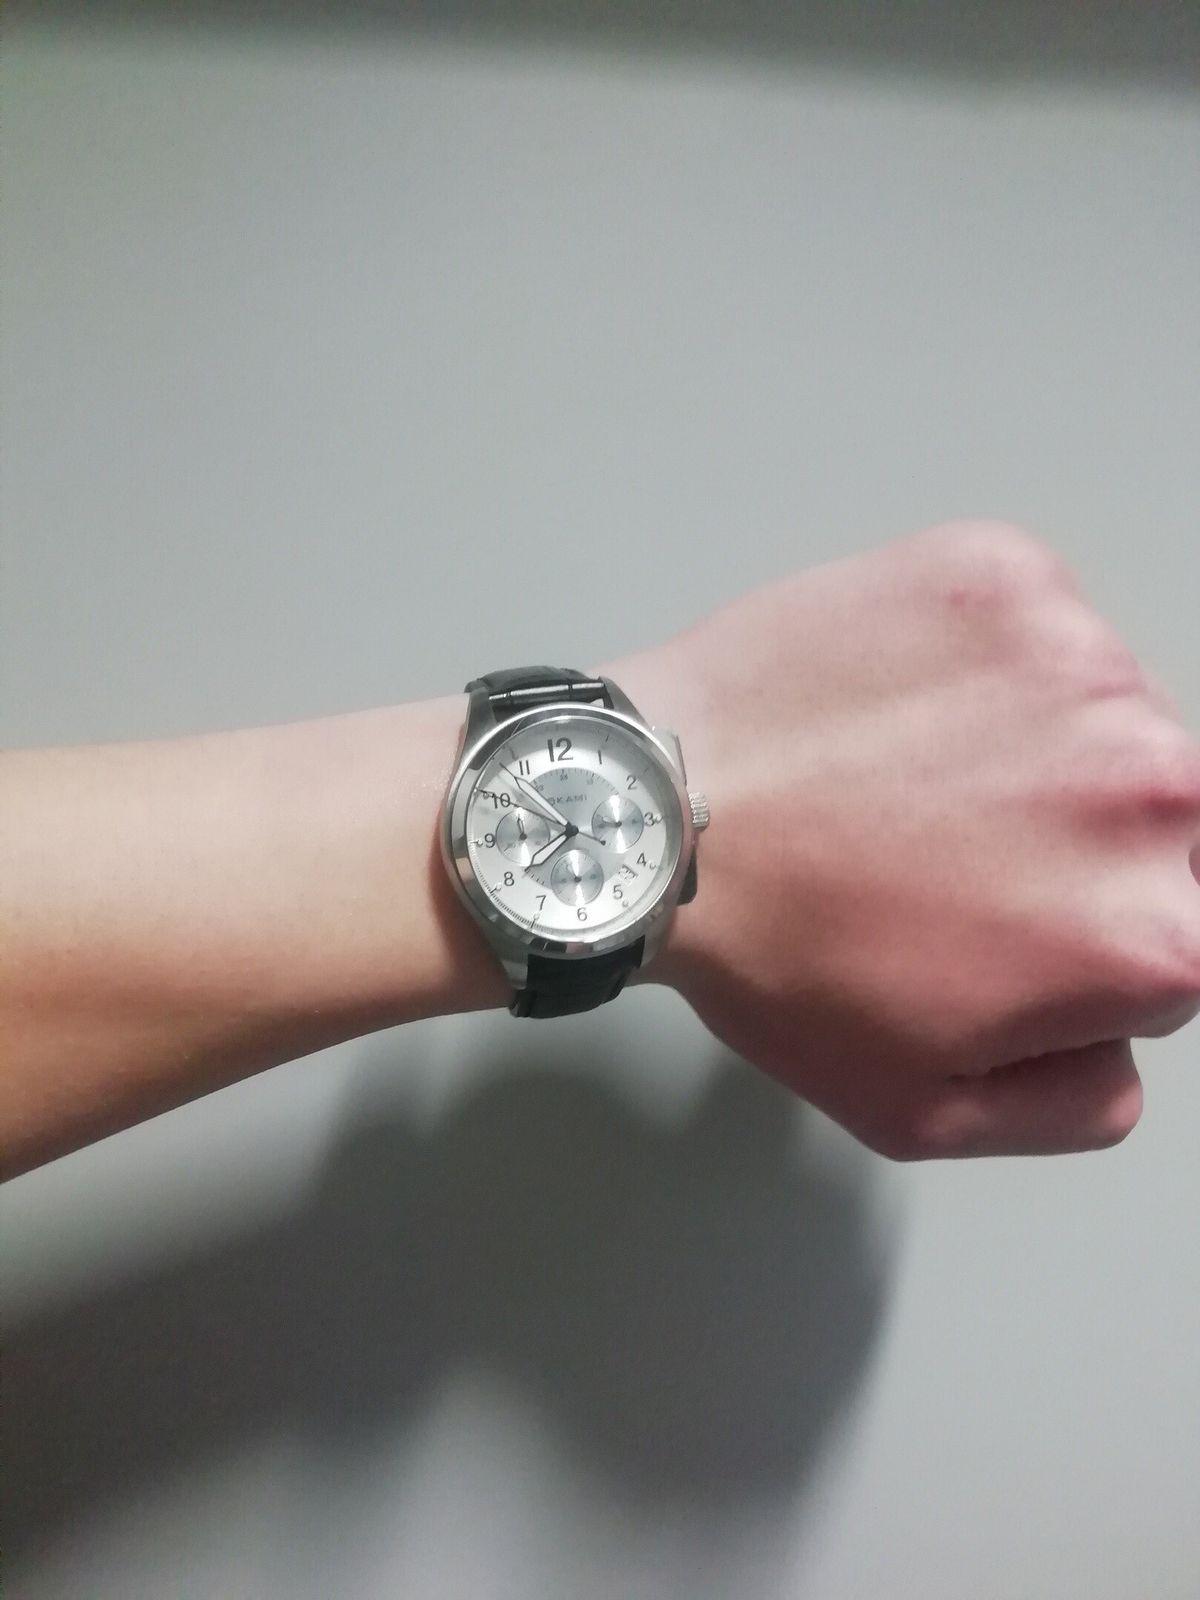 Мужские часы.